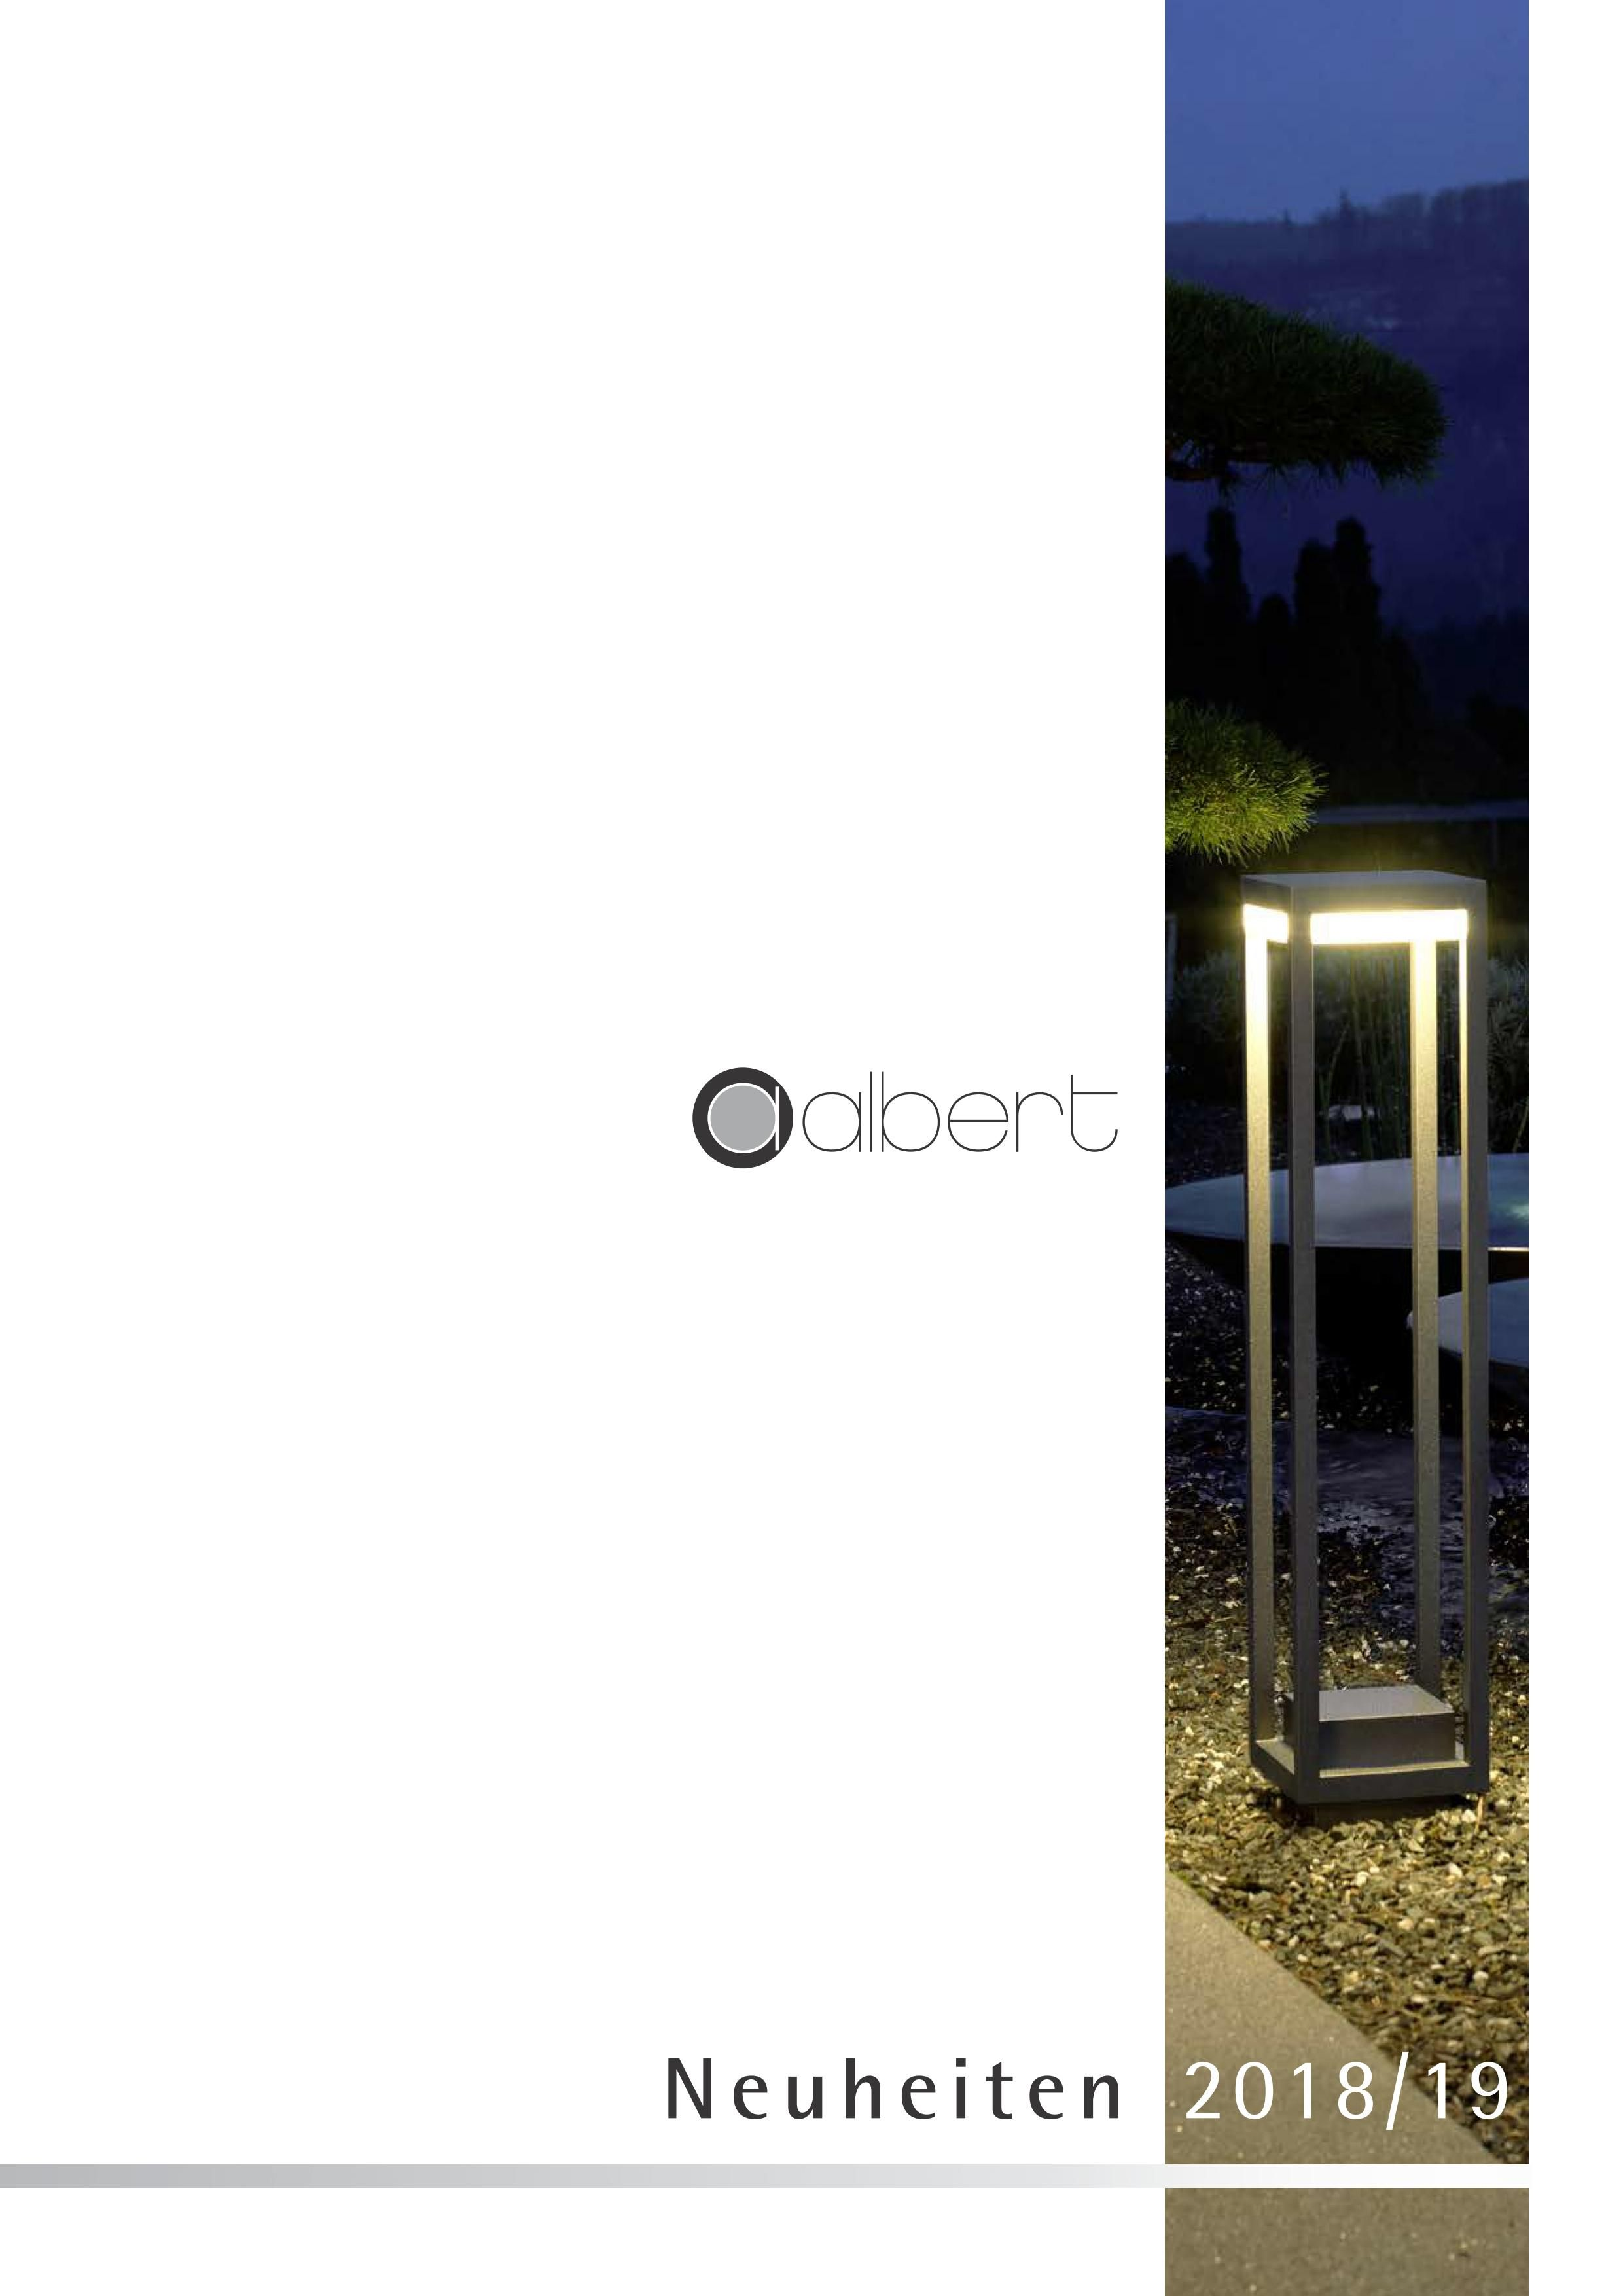 Info Albert Leuchten De Albert Leuchten Der Prospekt Neuheiten 2018 19 Ist Lieferbar Aussenleuchten Fur Den Bes Albert Leuchten Aussenleuchten Led Leuchtmittel